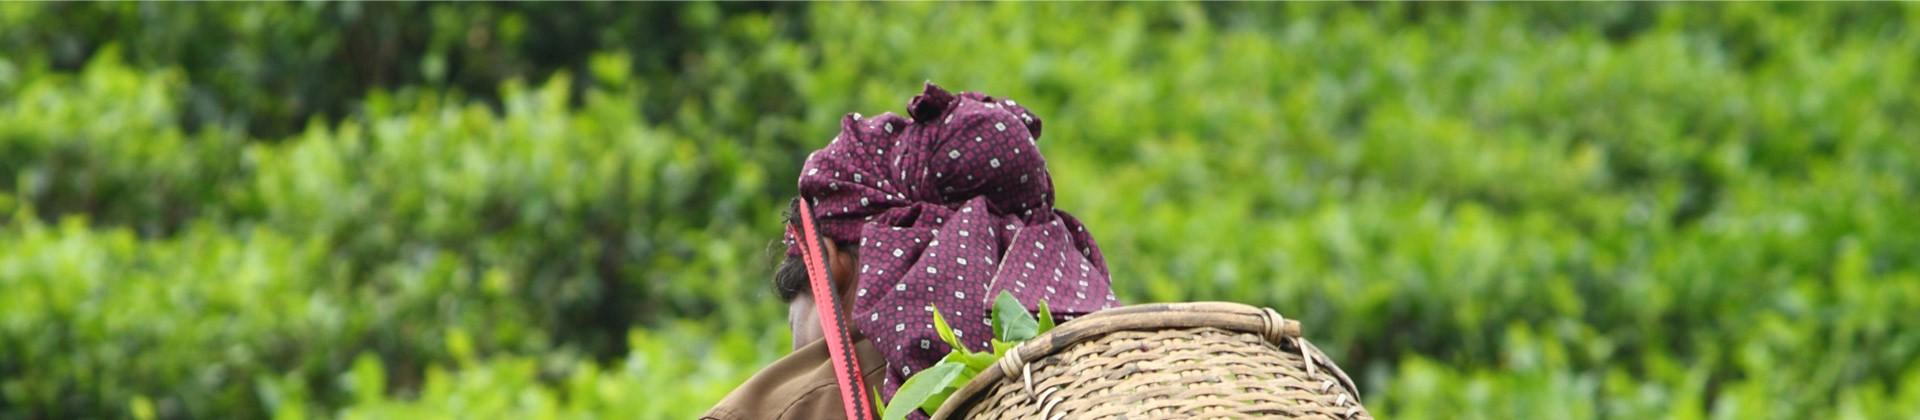 Recogiendo Moringa en el Himalaya (India)